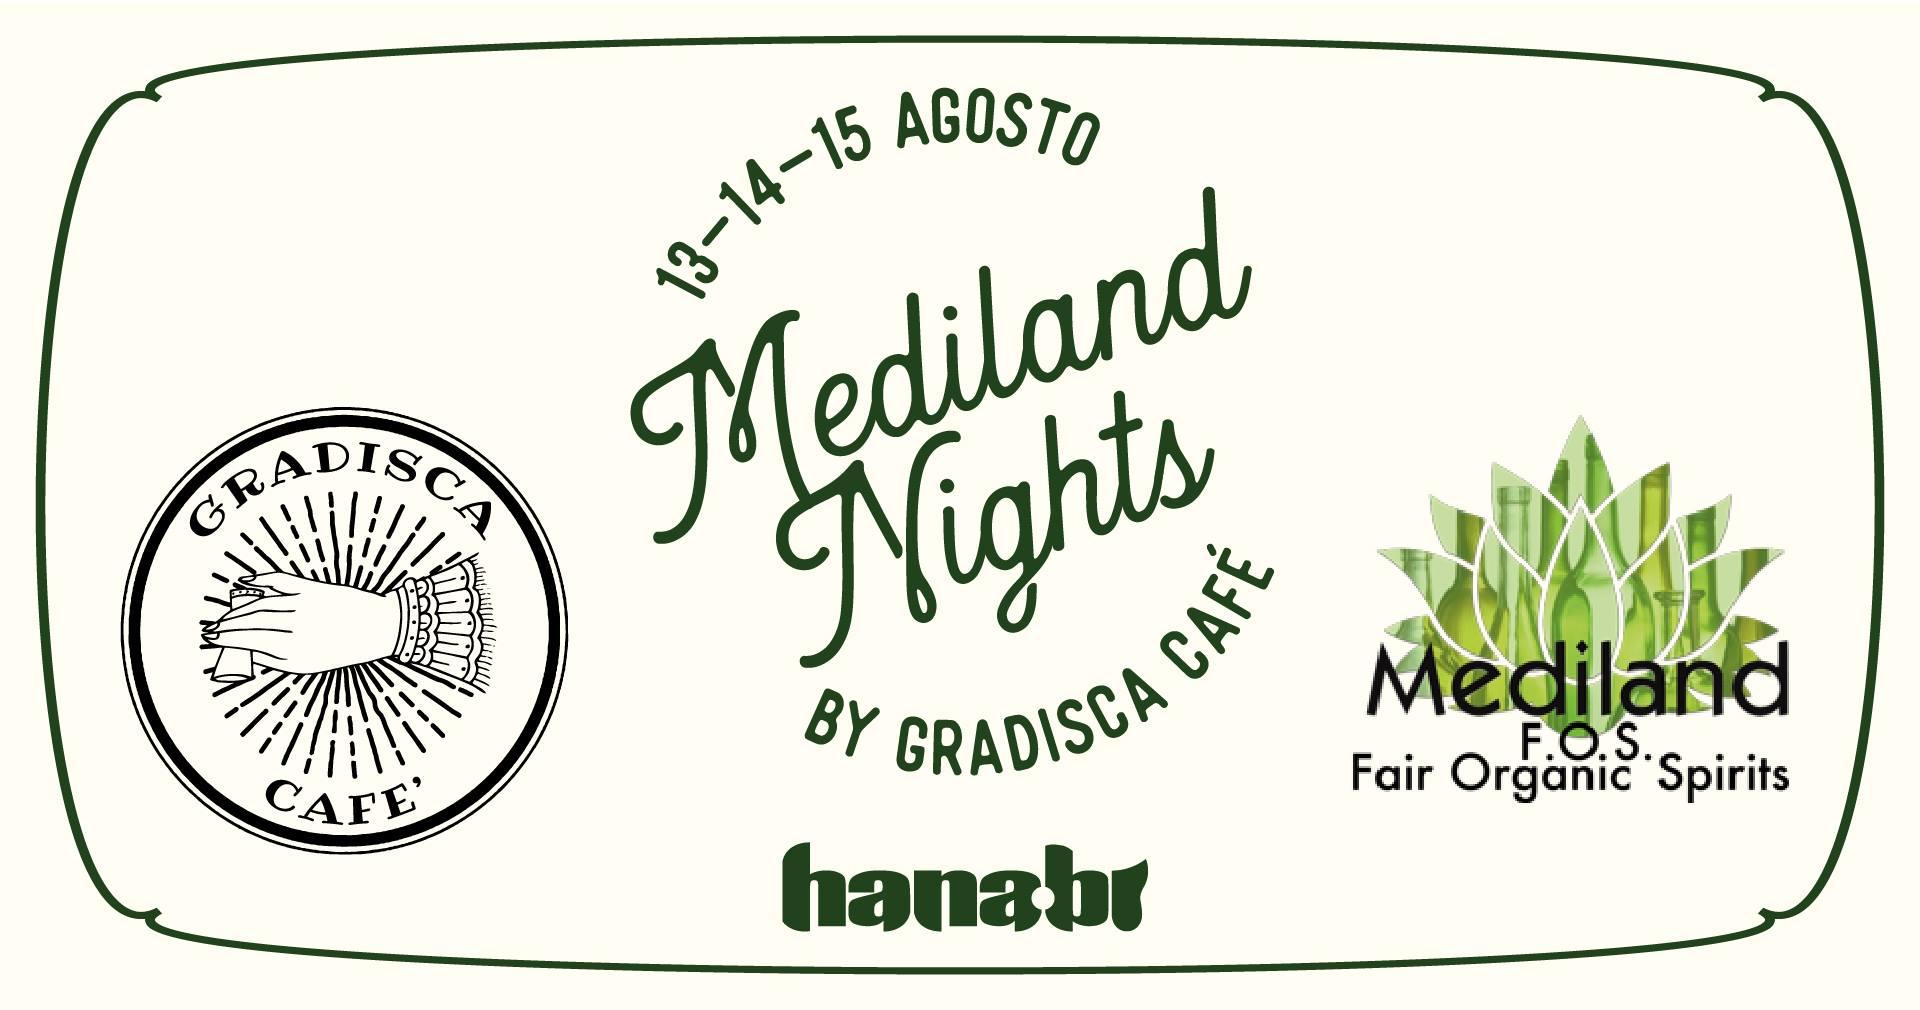 Mediland Nights by Gradisca Café